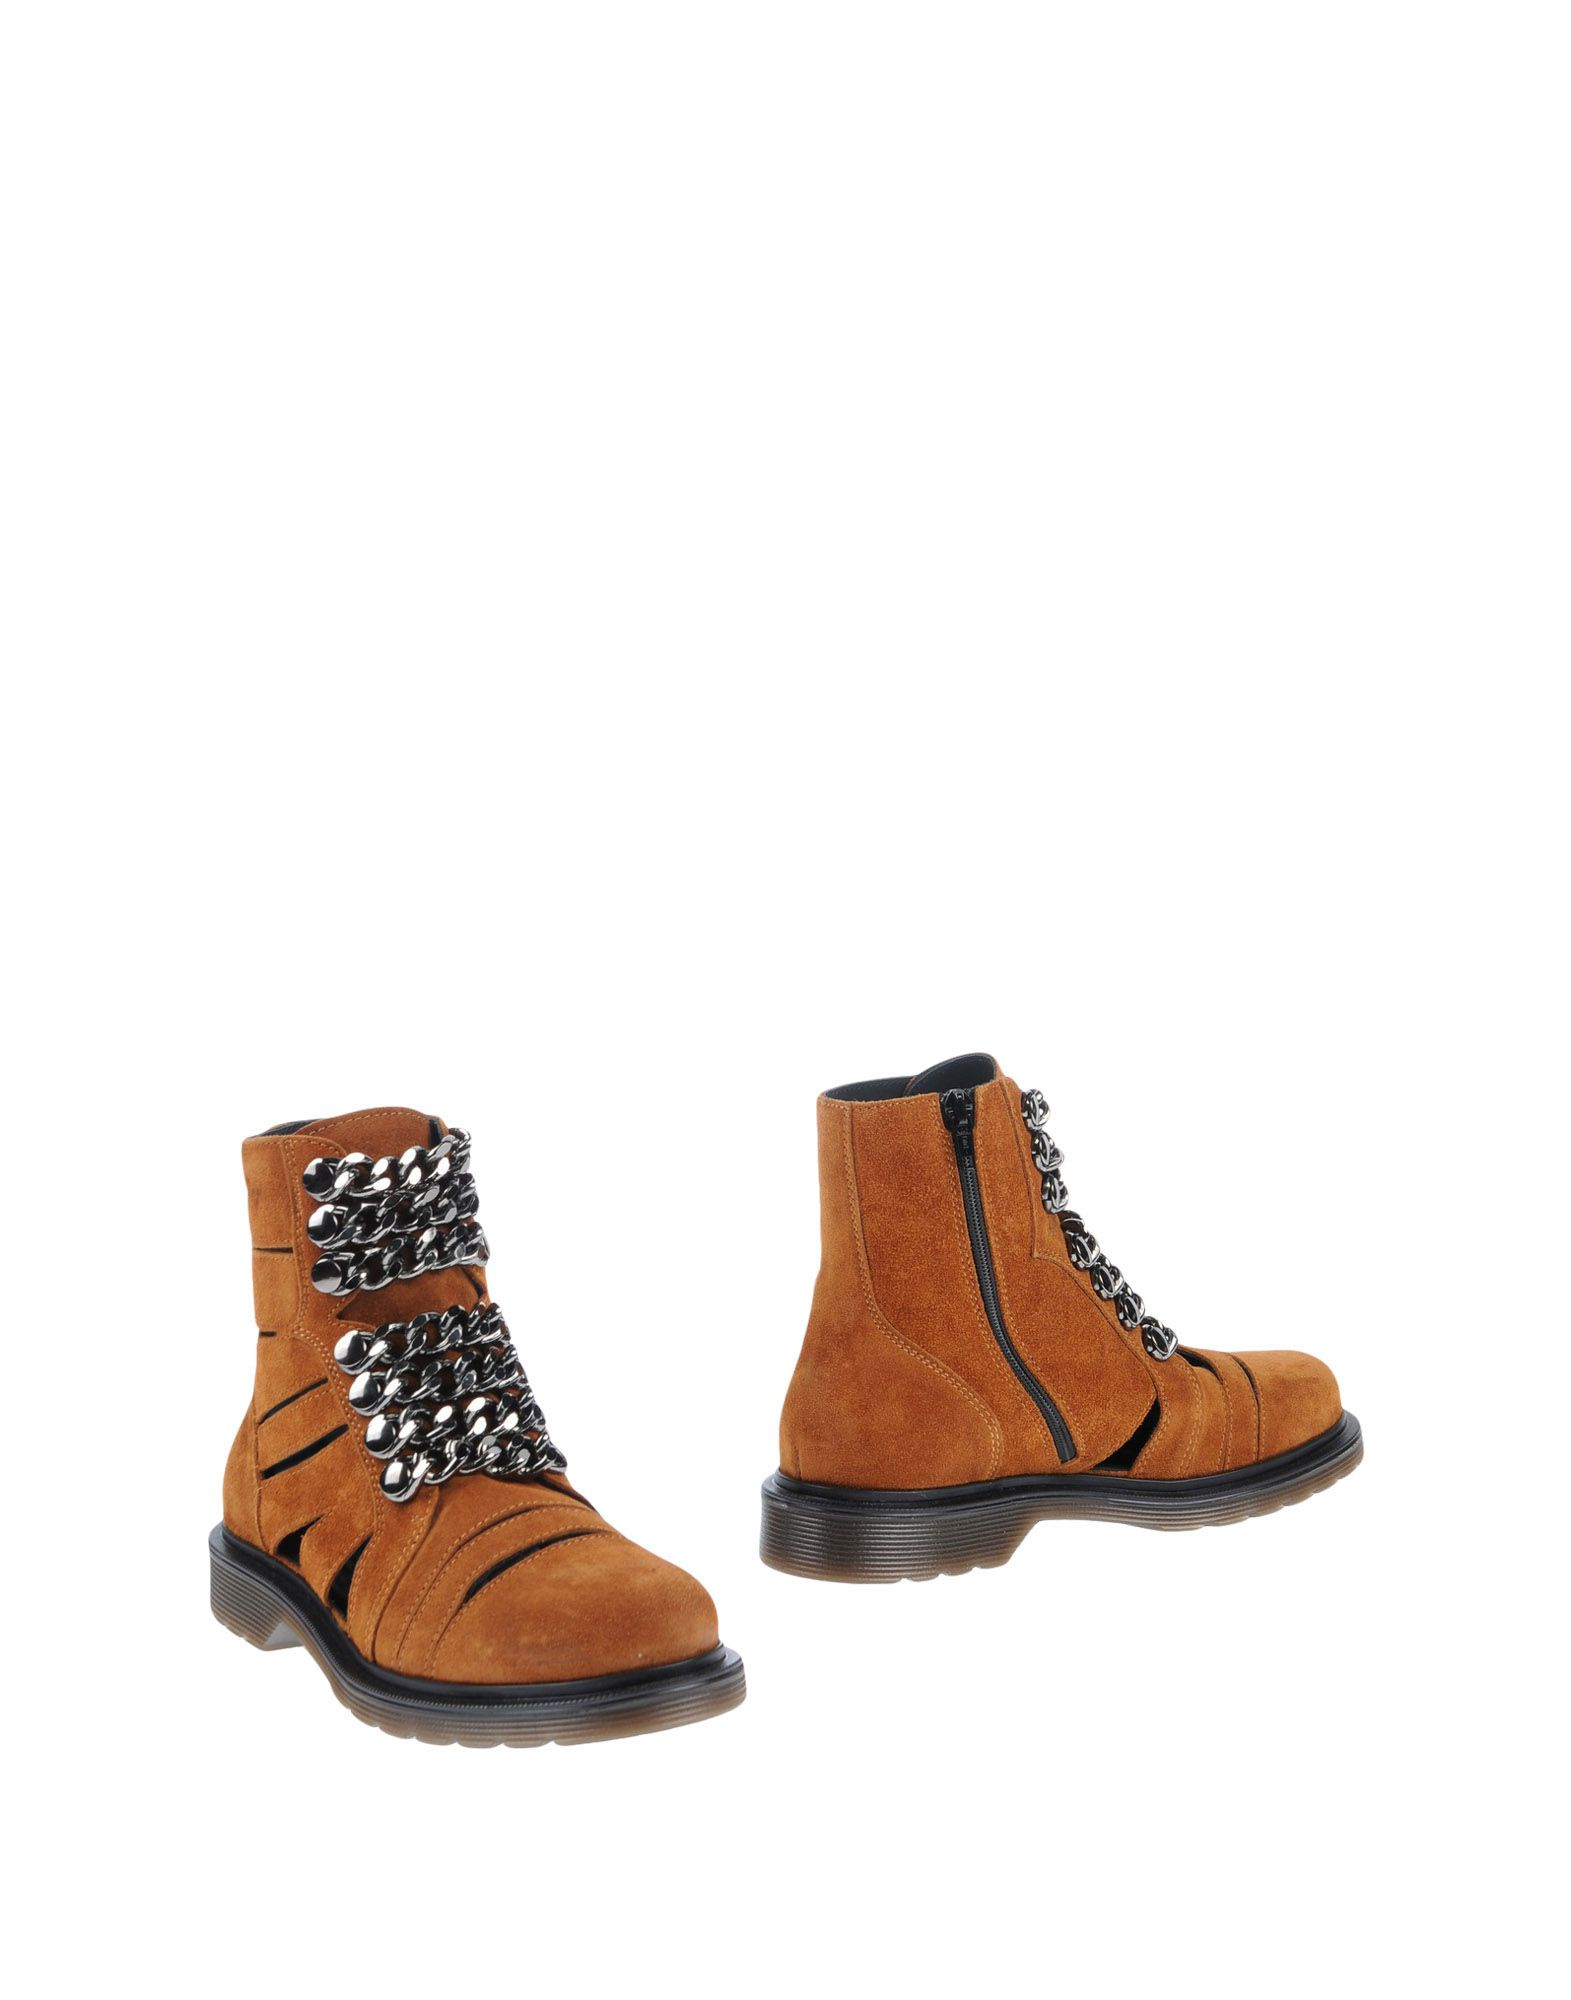 Le Dangerouge Stiefelette Damen  11506264GGGut aussehende strapazierfähige Schuhe